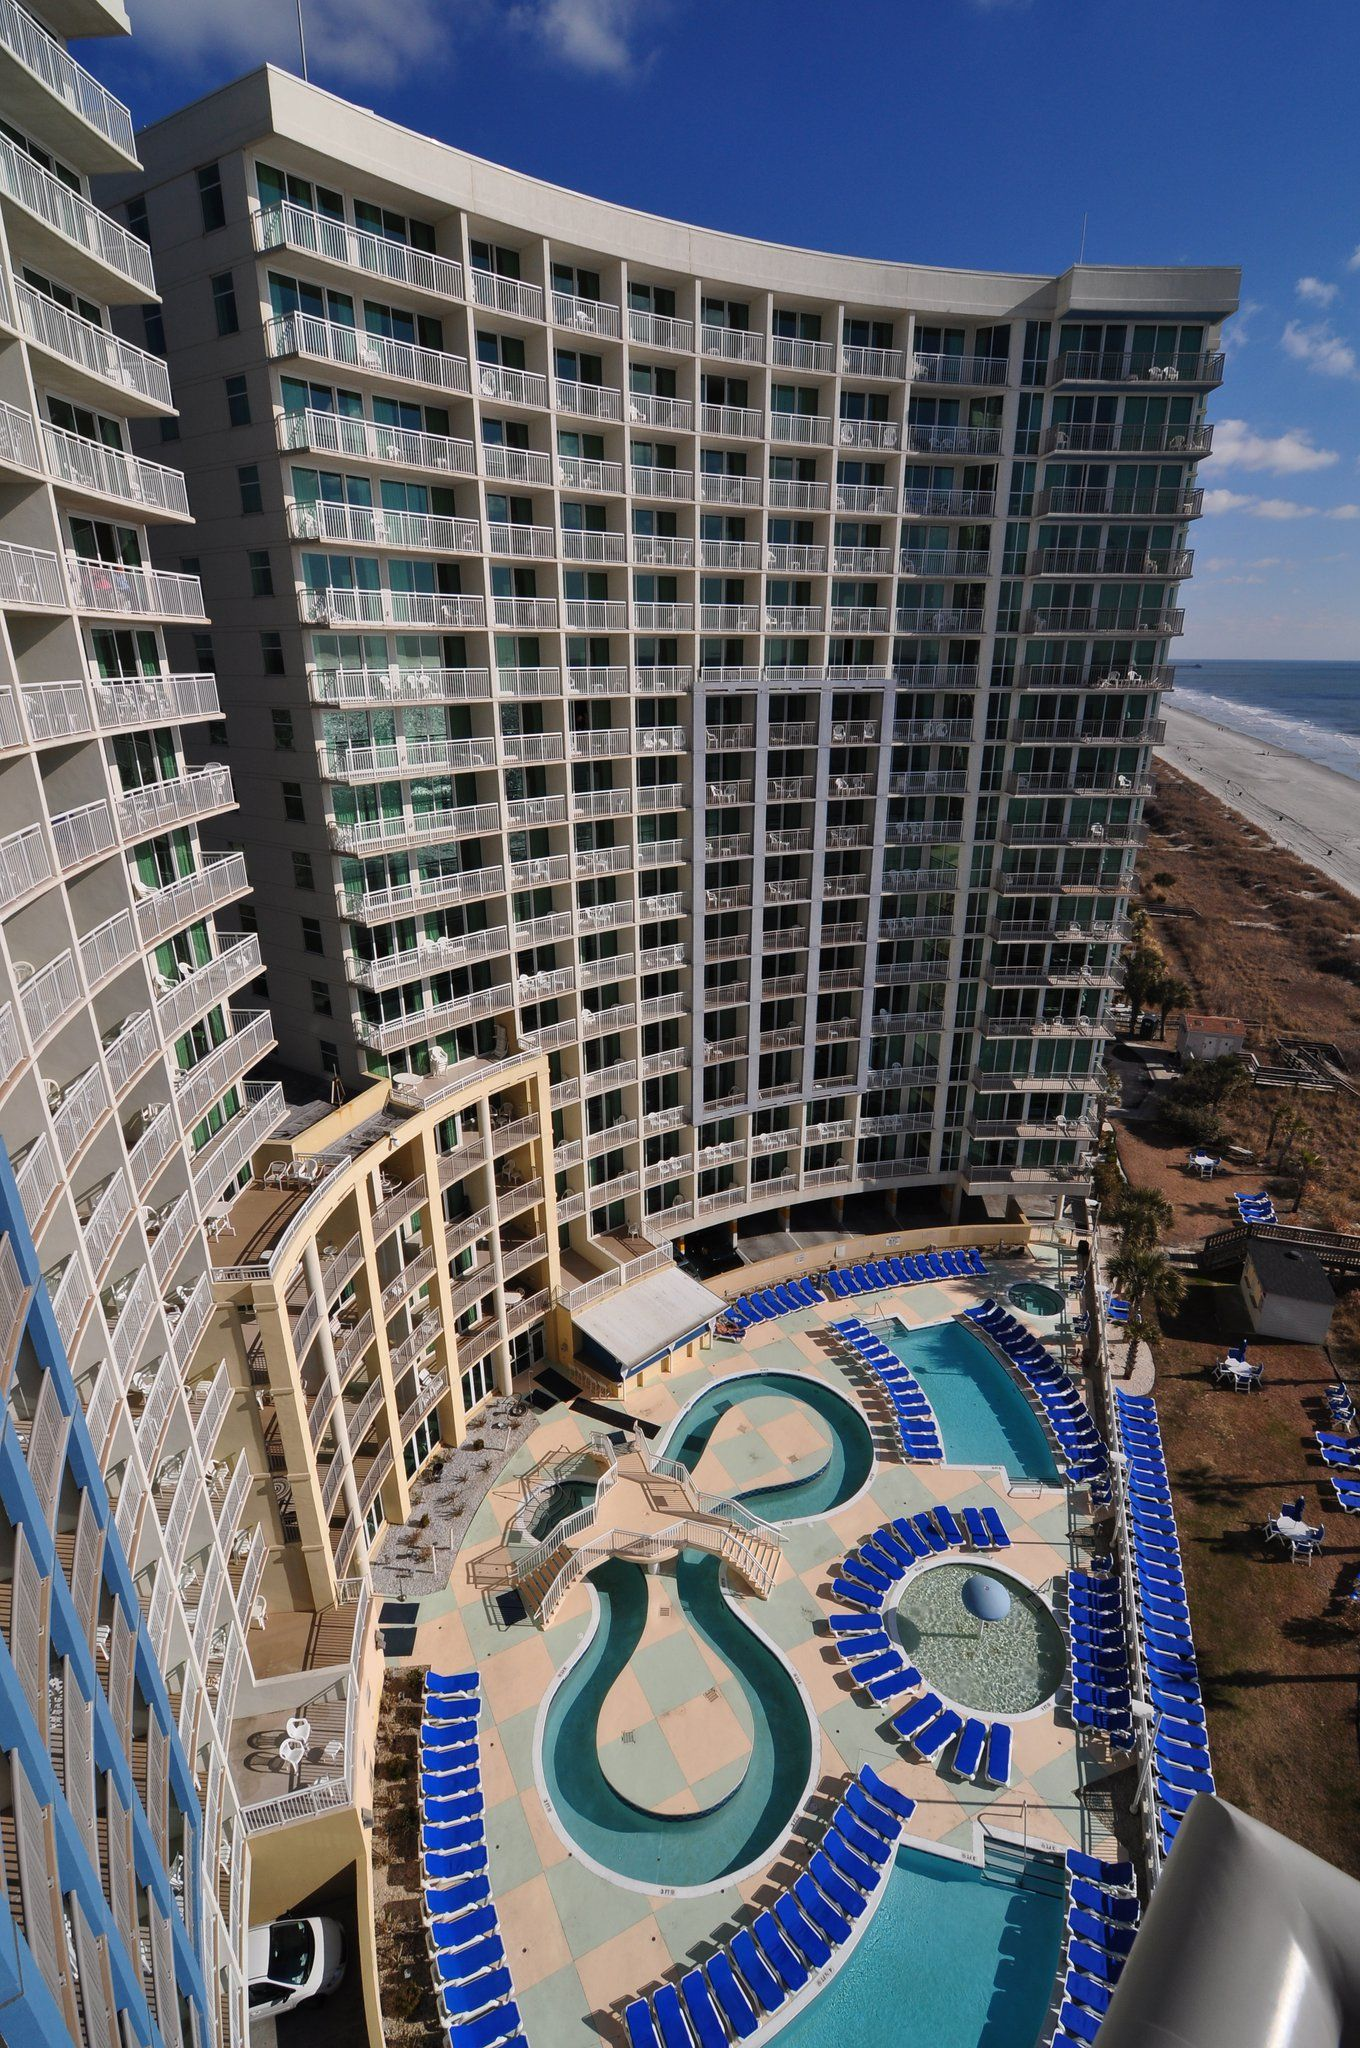 A Unique View Of Avista Resort, Located At 300 North Ocean